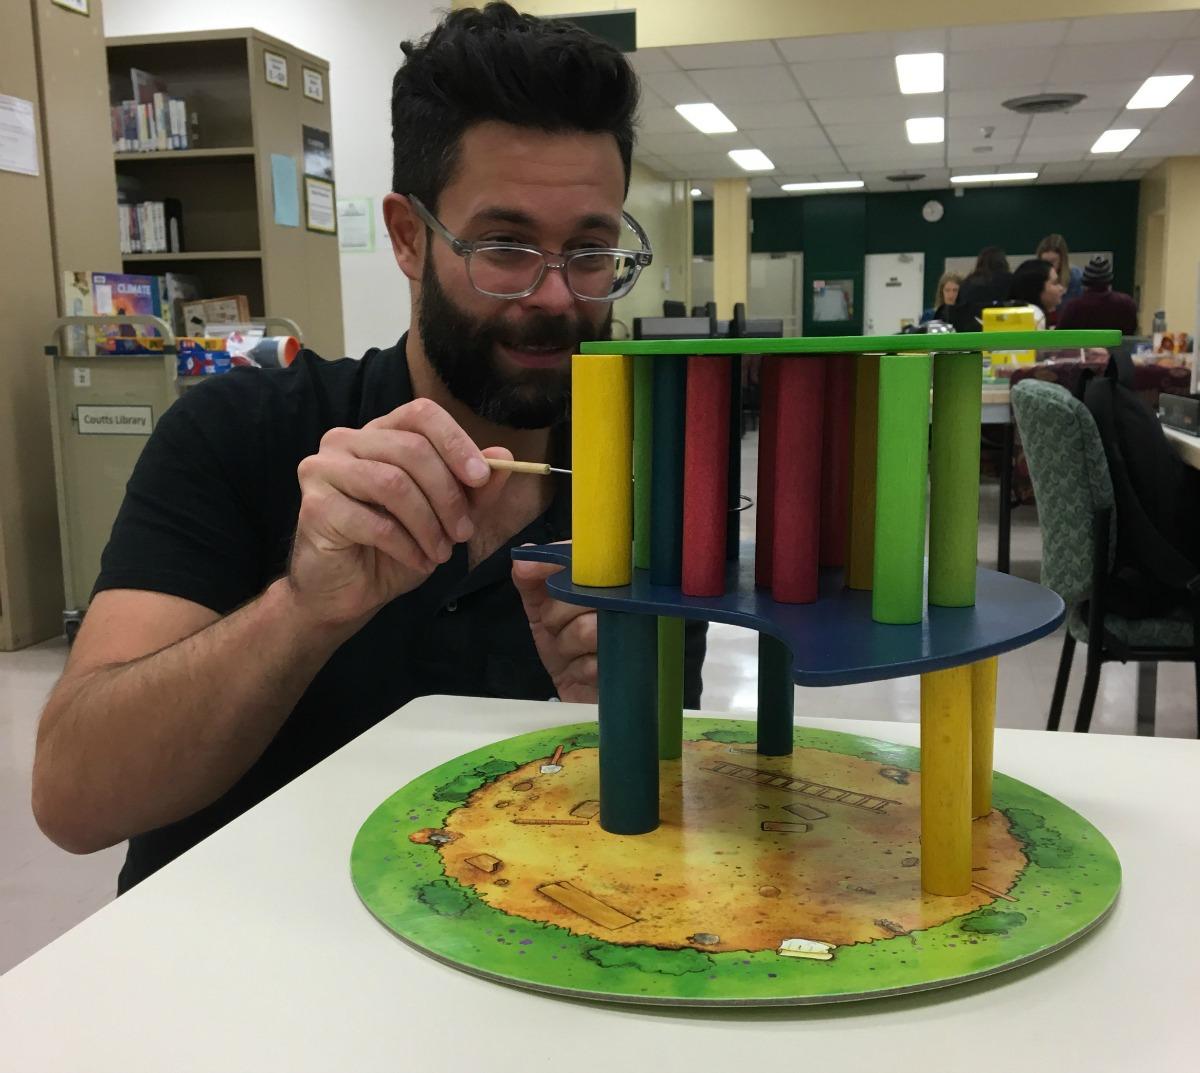 Games STEM teachers play